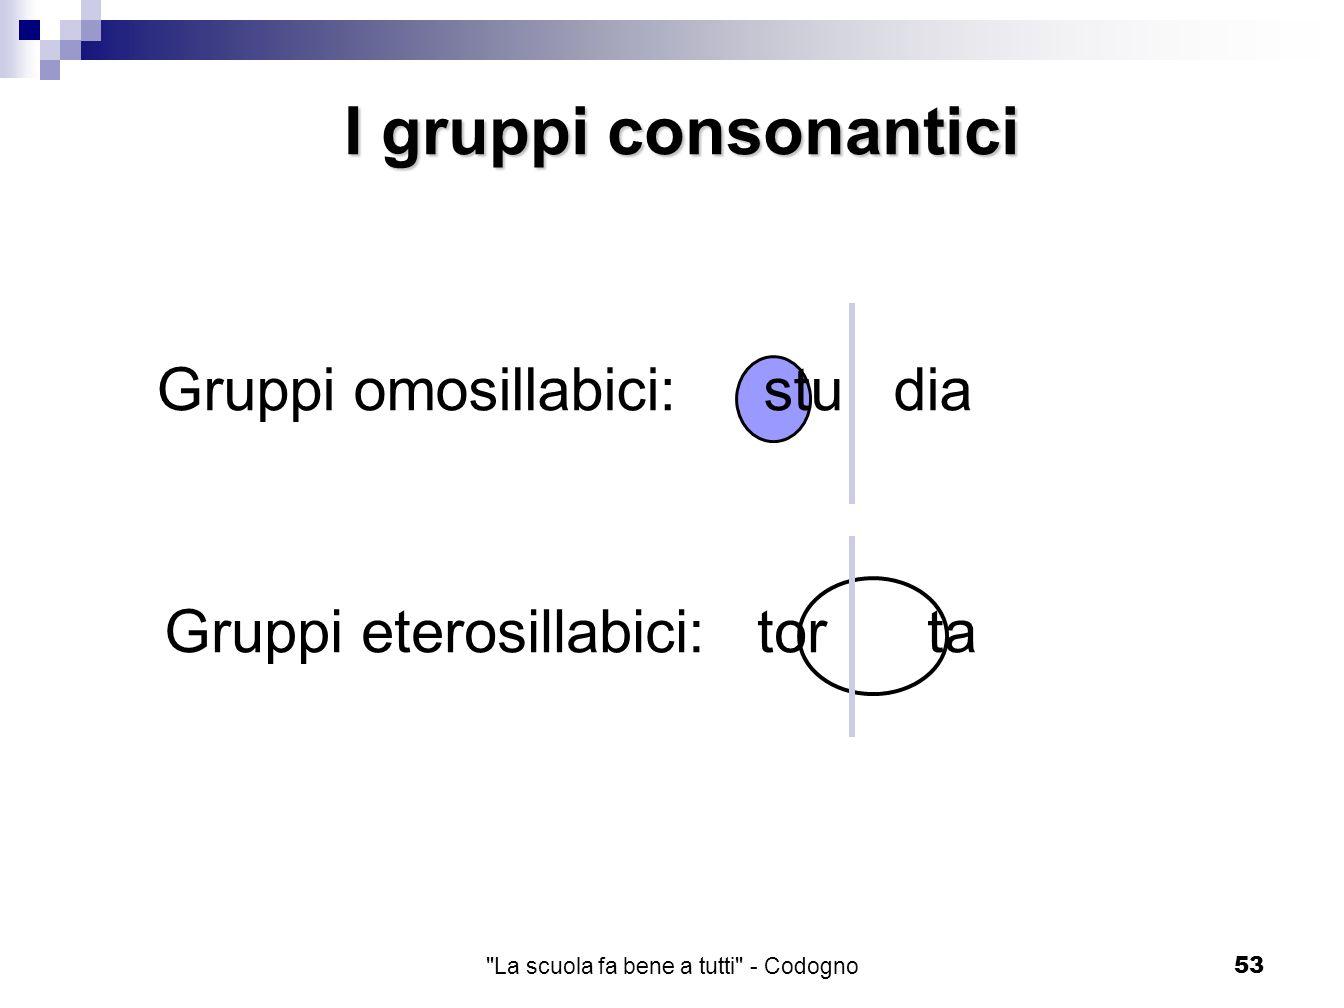 La scuola fa bene a tutti - Codogno53 I gruppi consonantici Gruppi omosillabici: stu dia Gruppi eterosillabici: tor ta